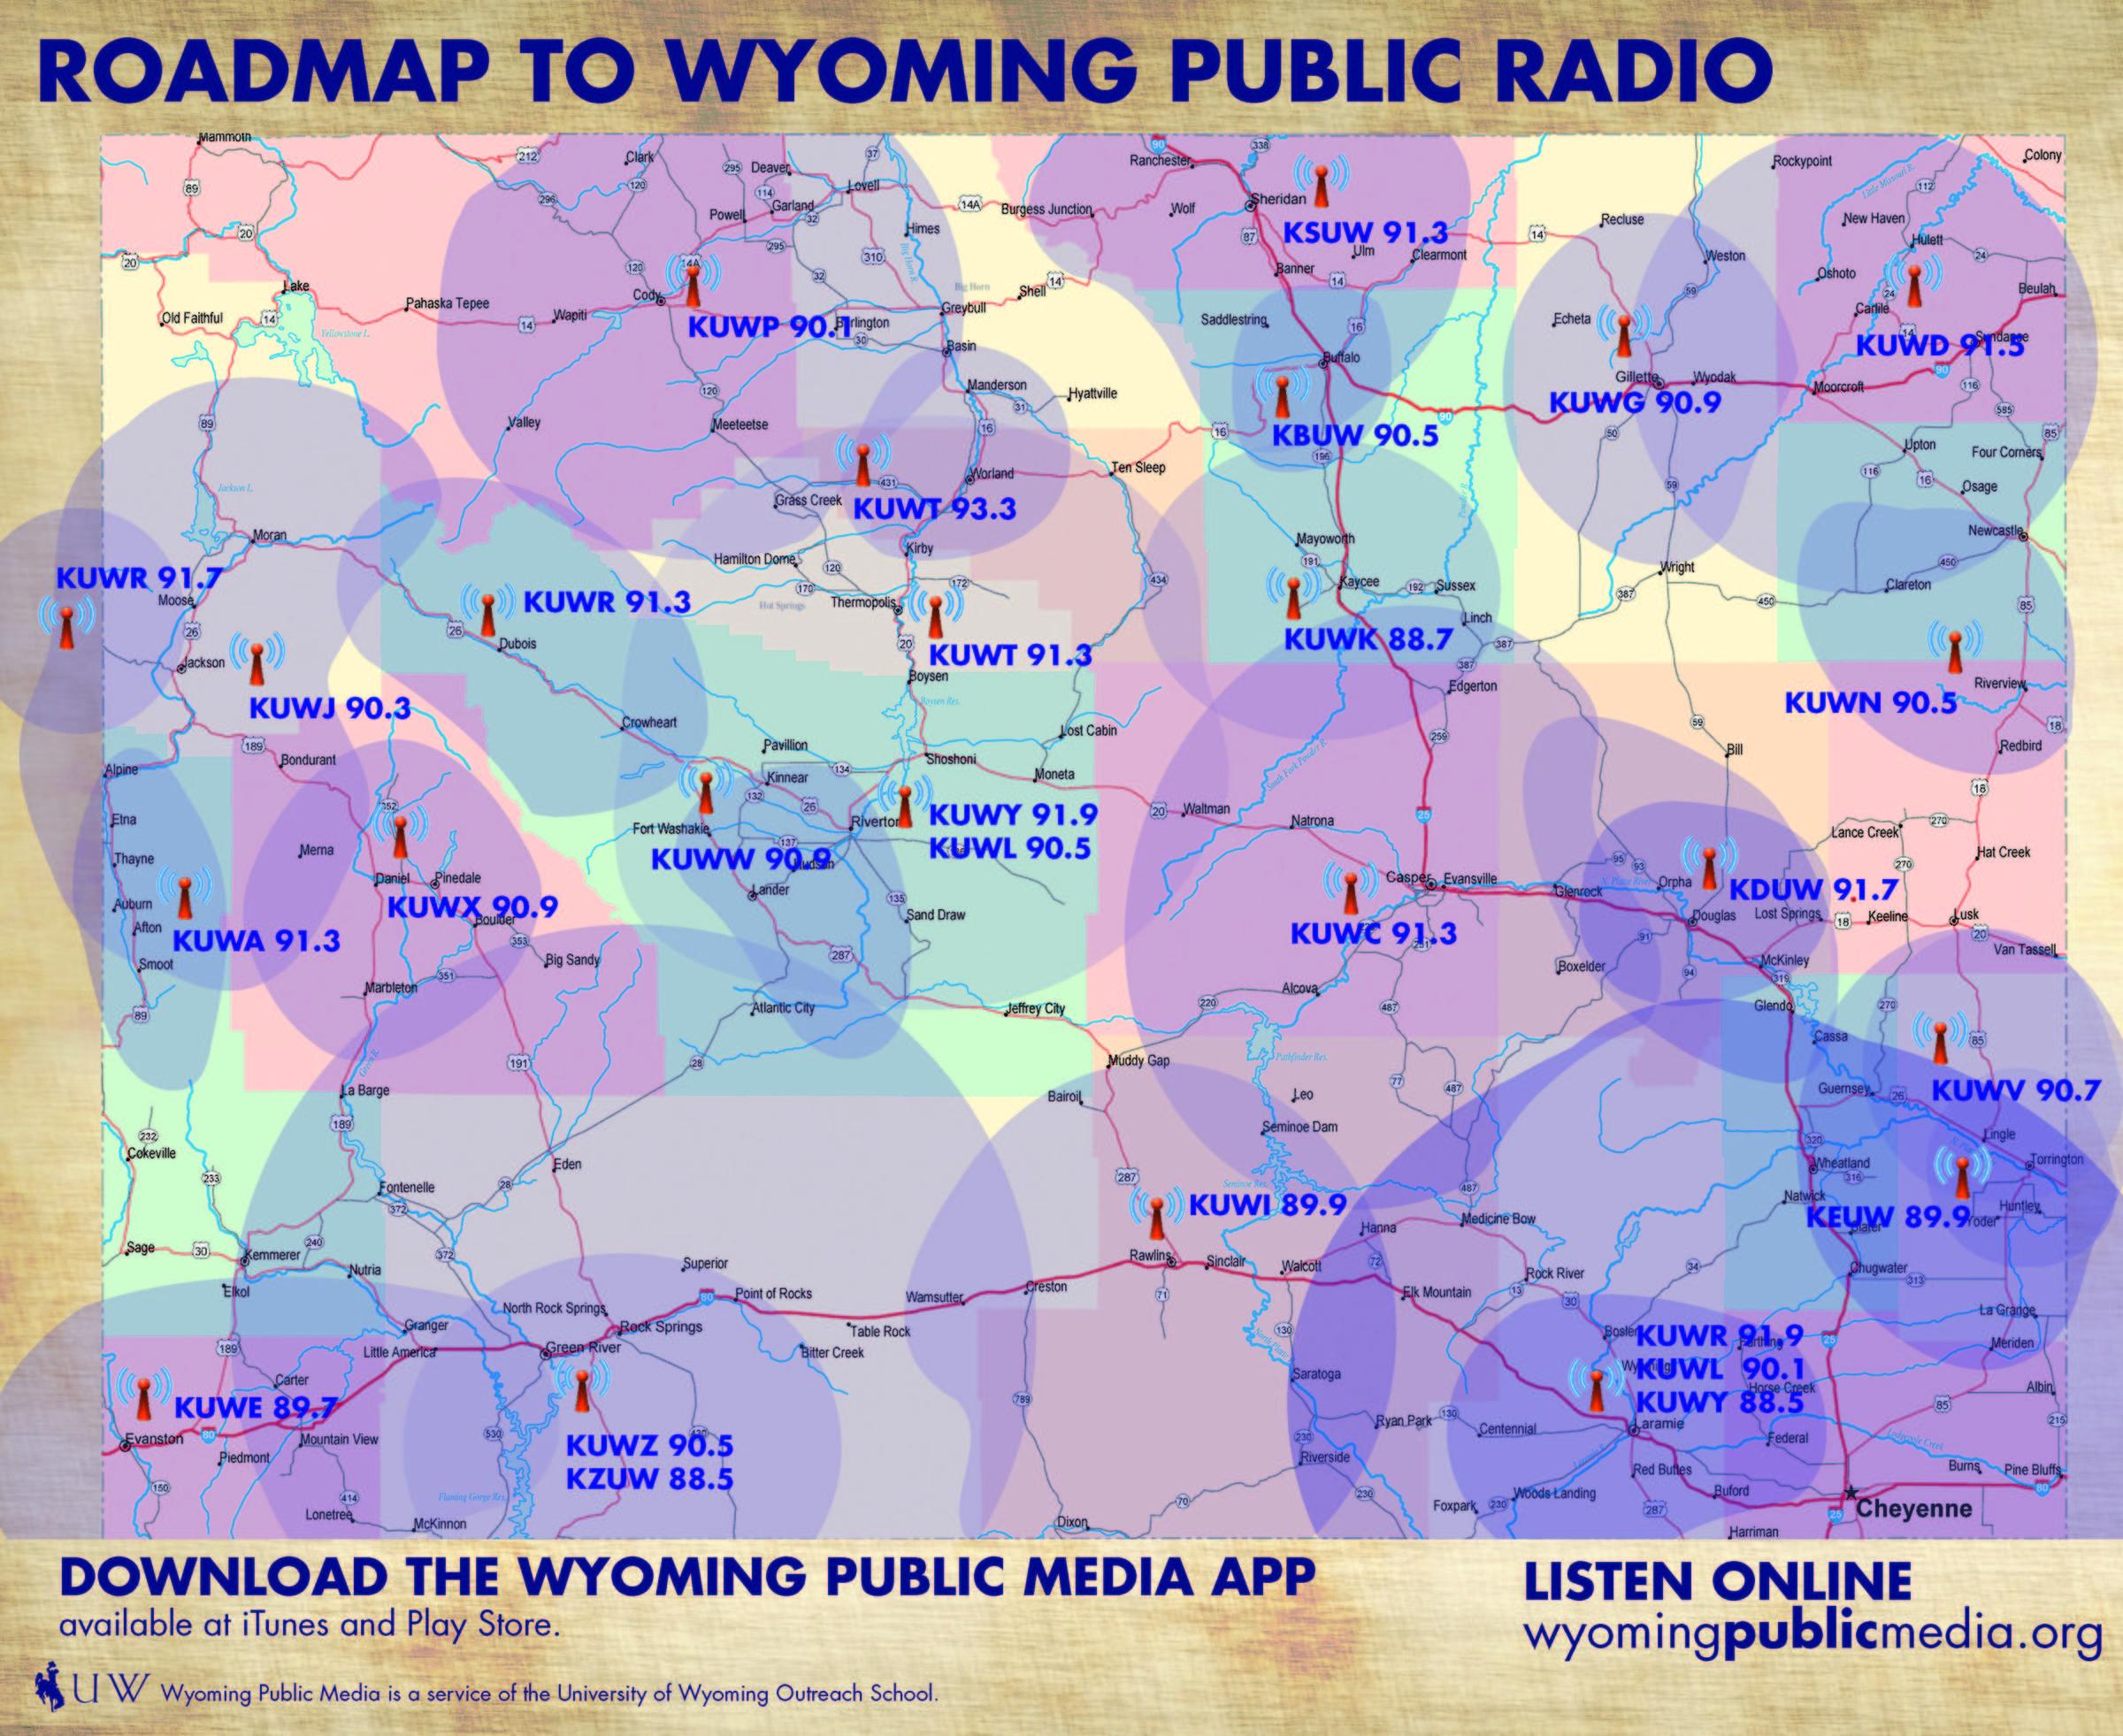 Roadmap To Wyoming Public Radio | Wyoming Public Media